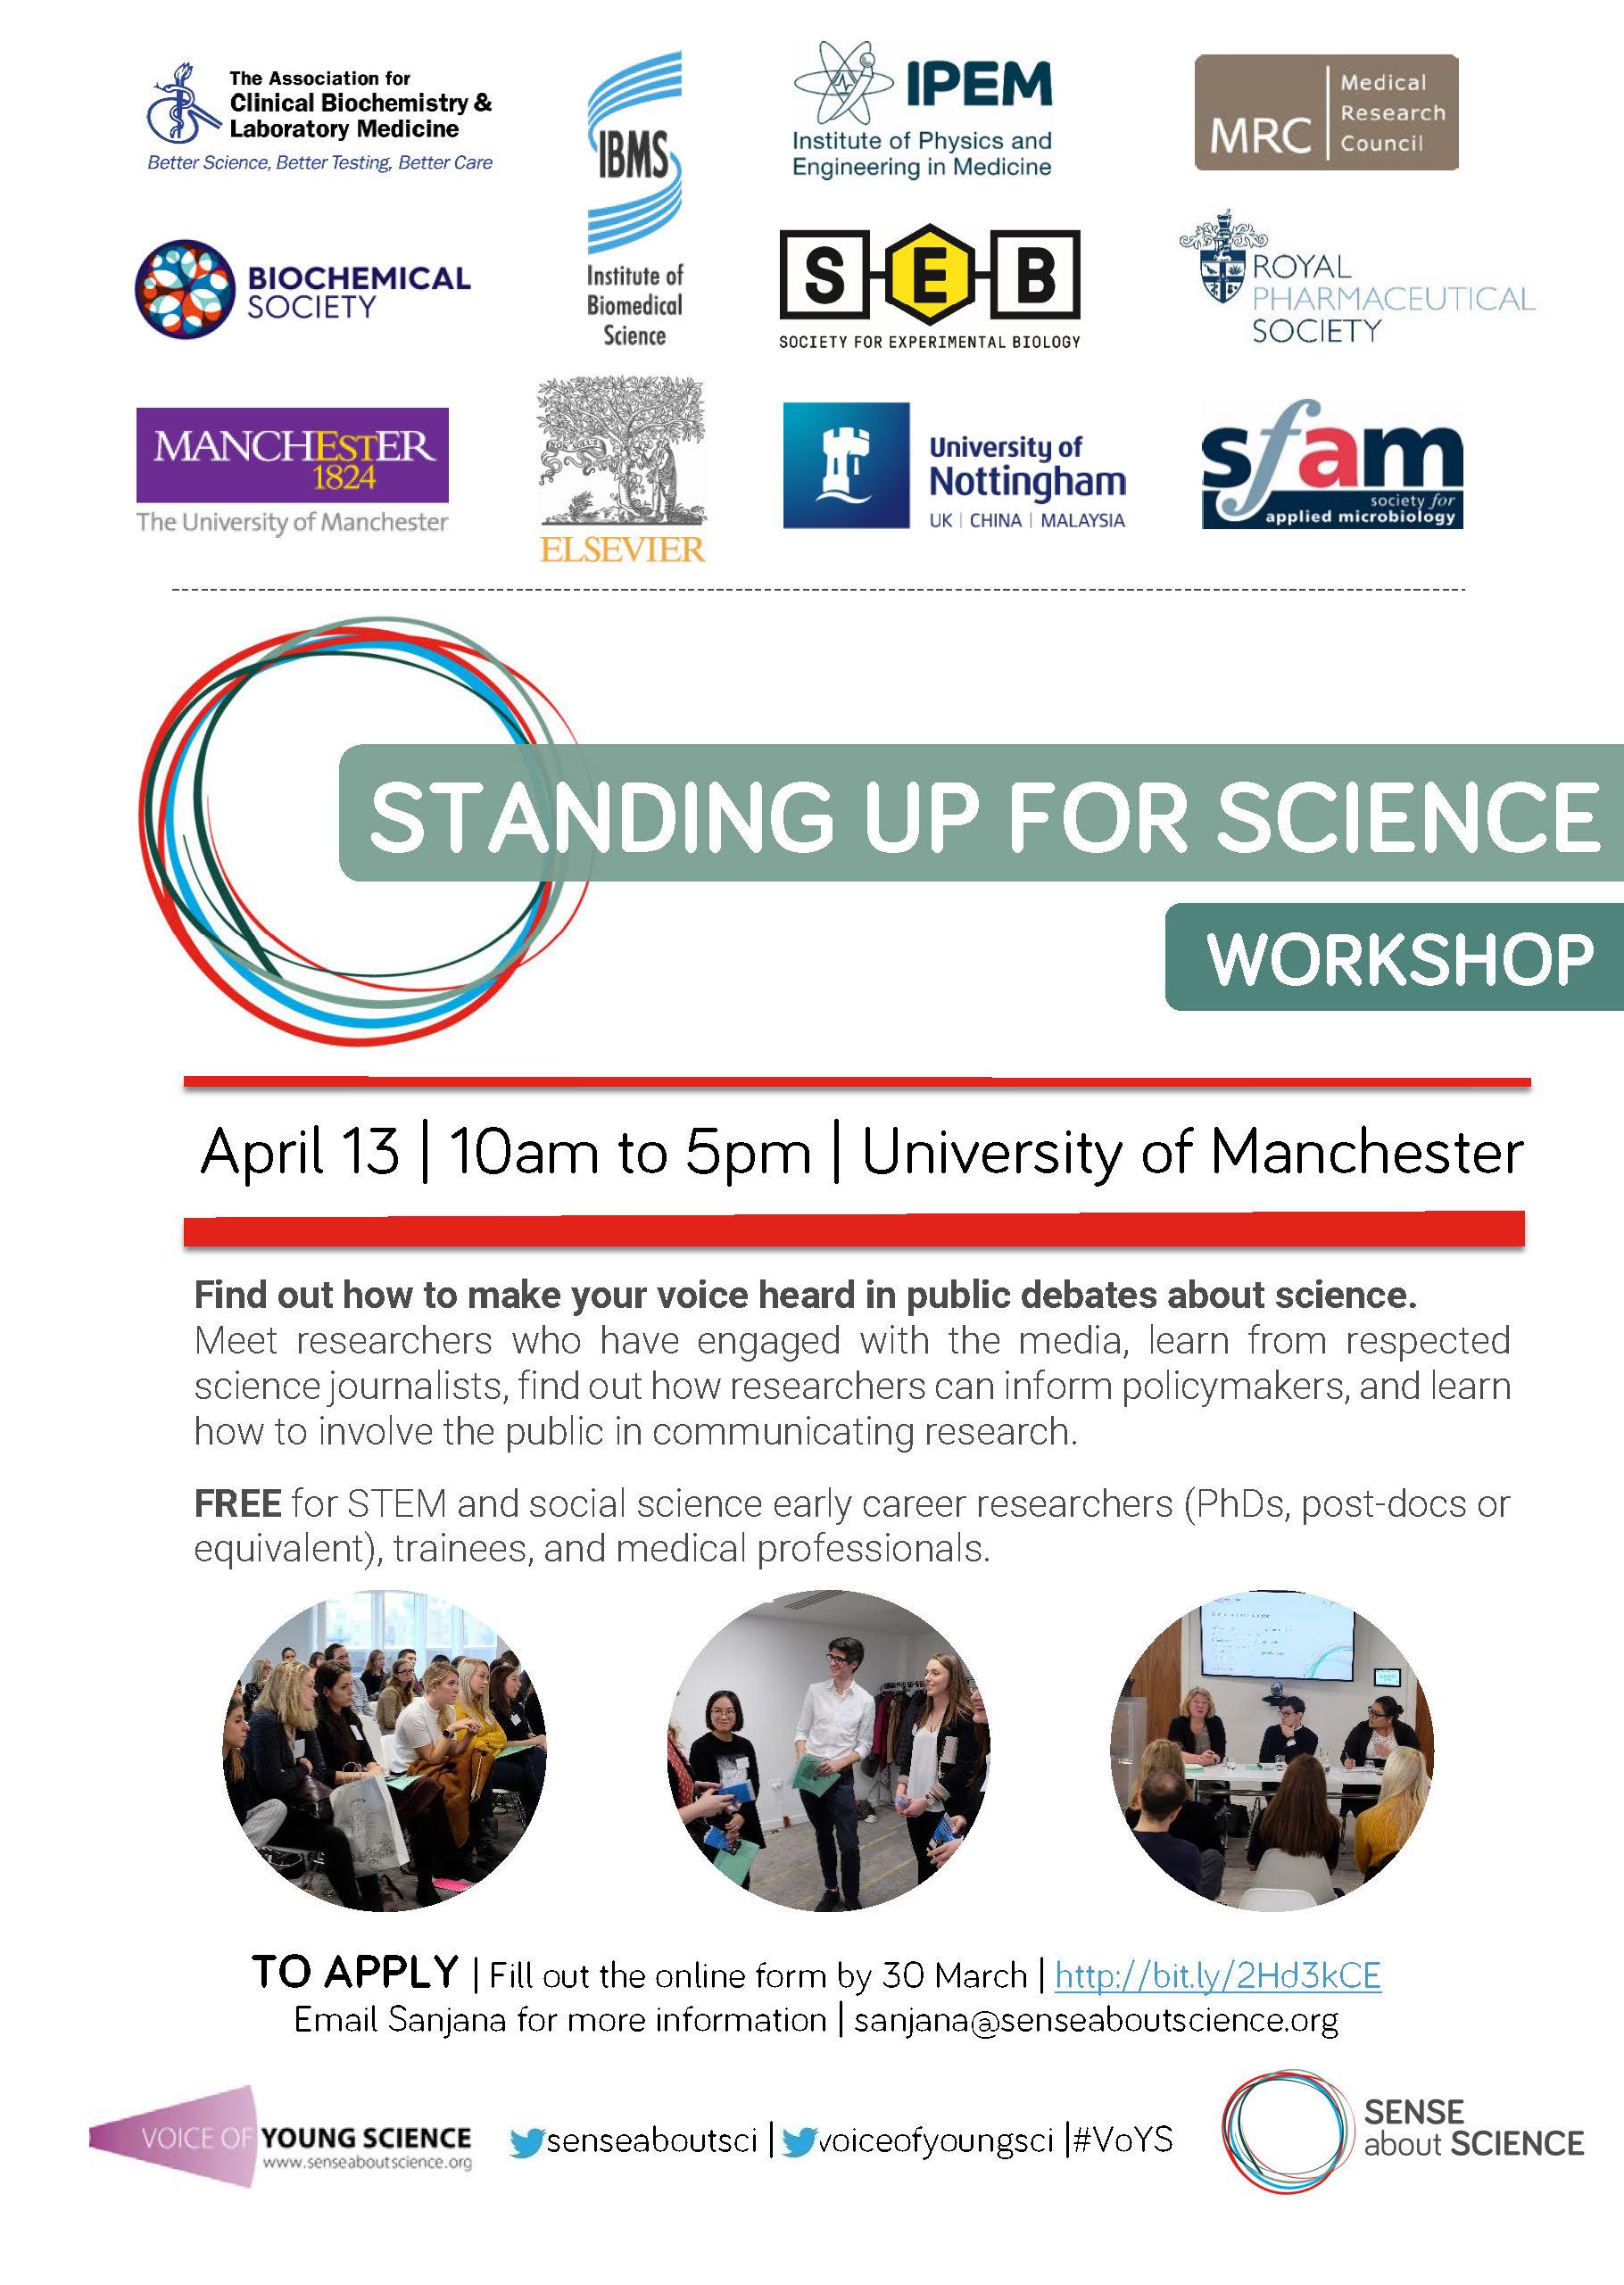 VoYS Manchester 2018 workshop flyer